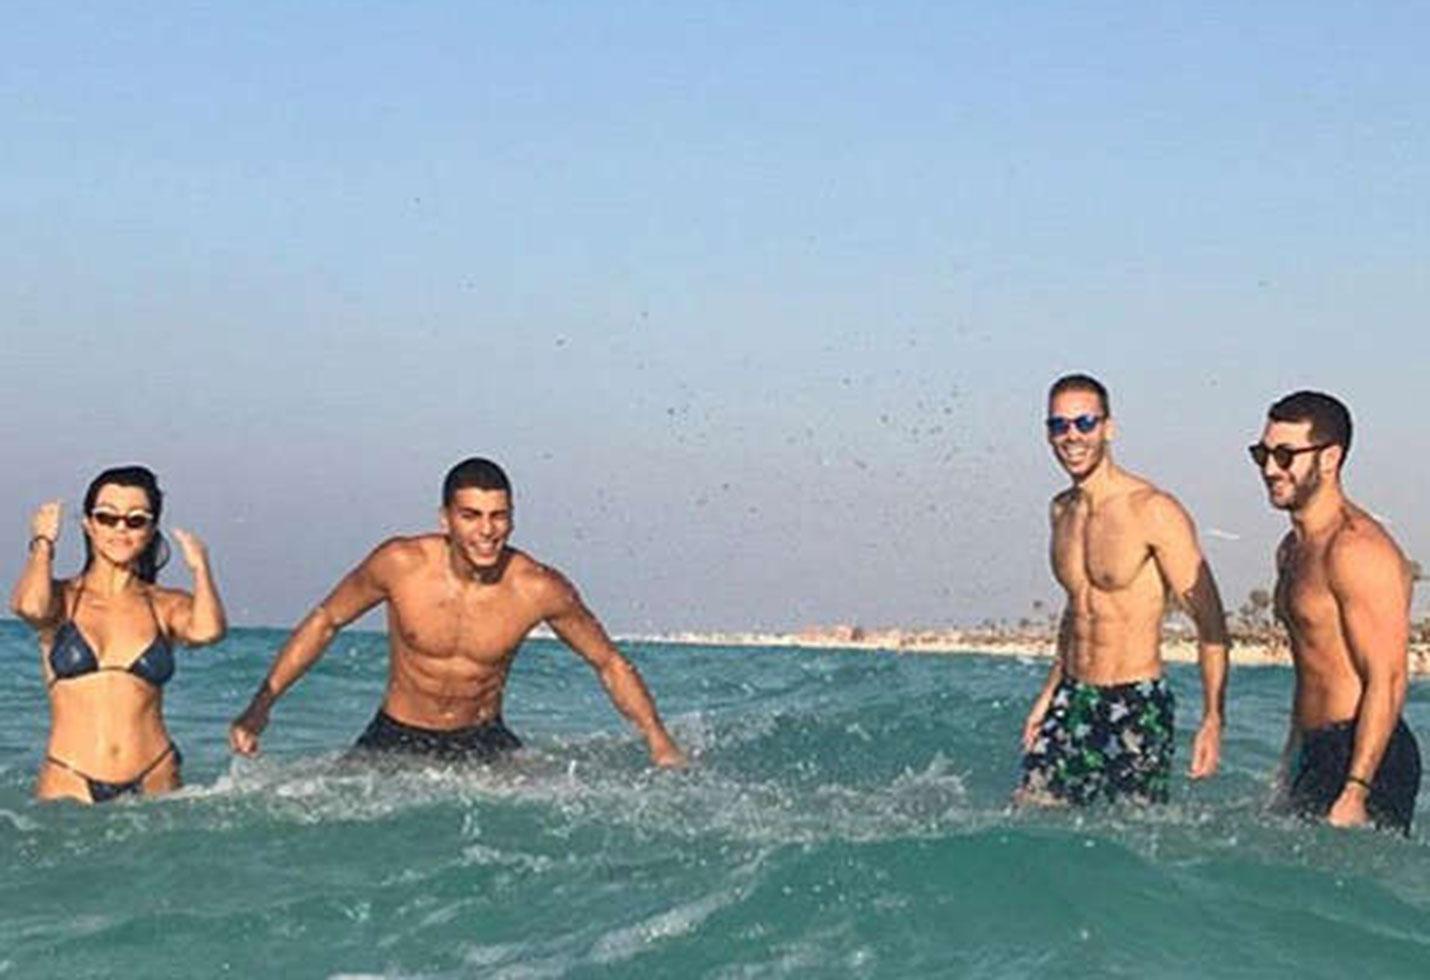 Kourtney kardashian bikini abs vacation egypt younes bendjima